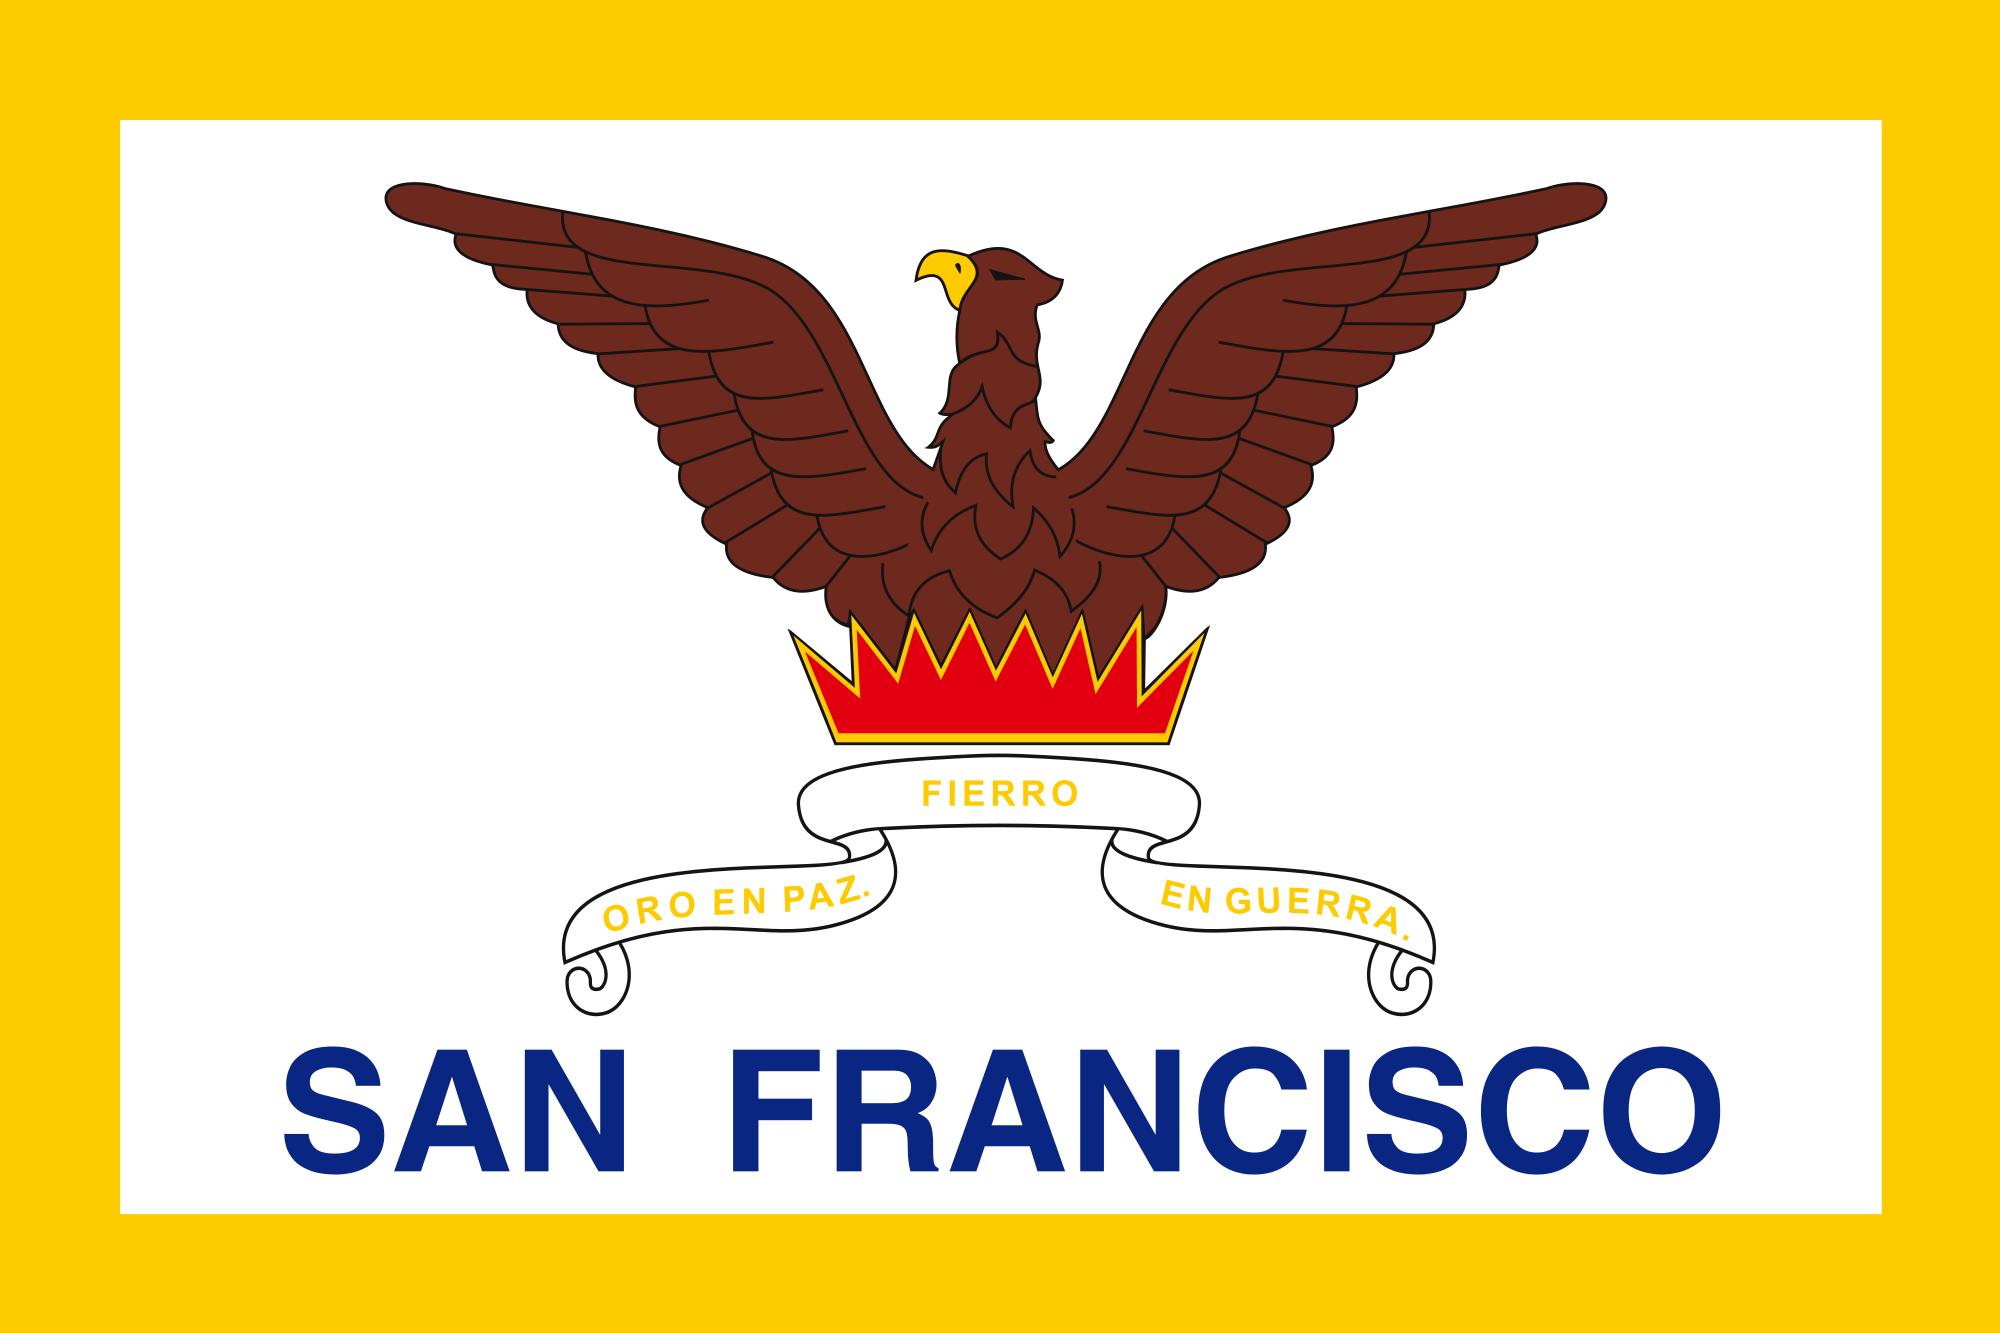 San Francisco City Flags